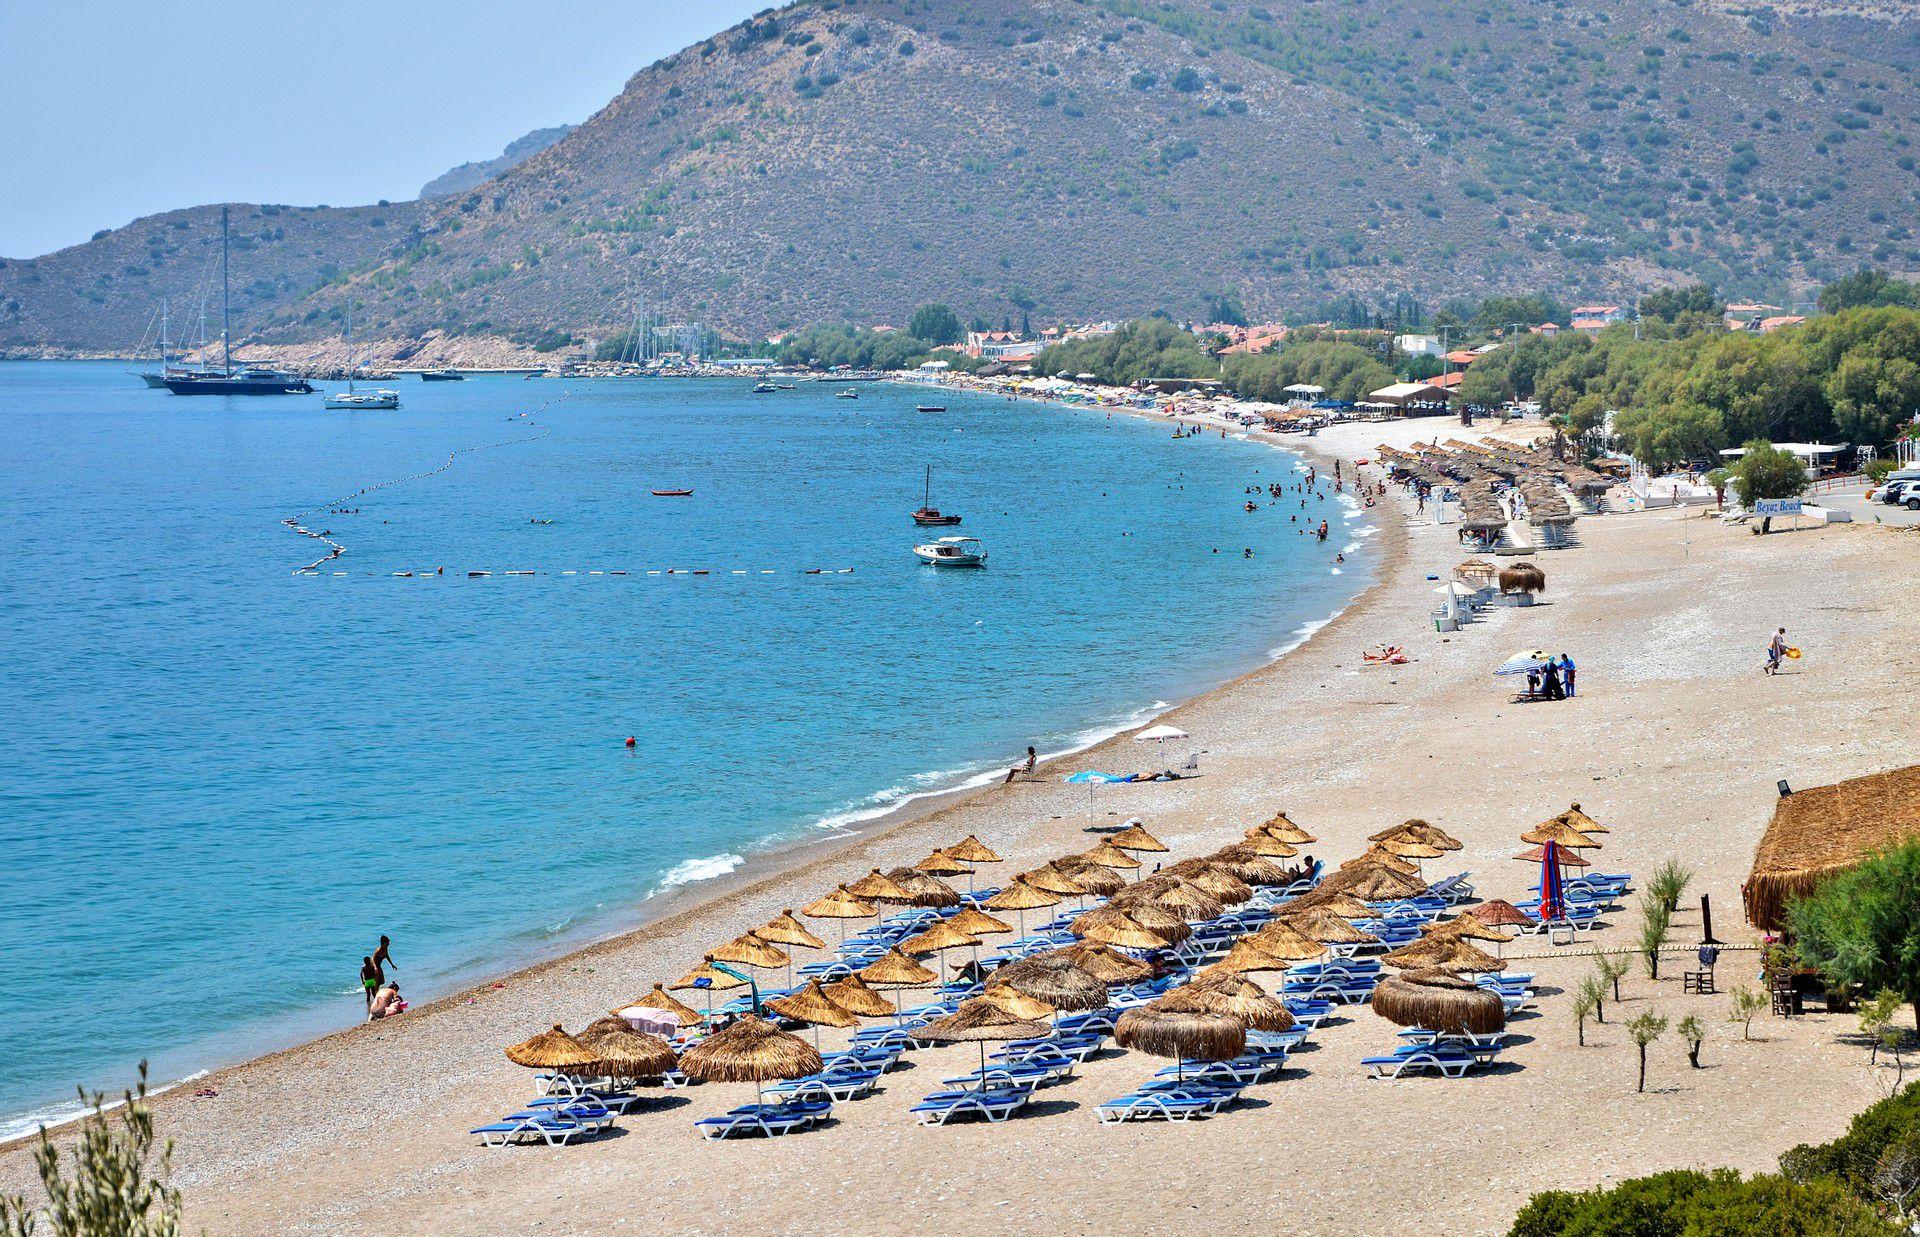 Datça's Palamutbükü Beach is one of the best Turkish beaches